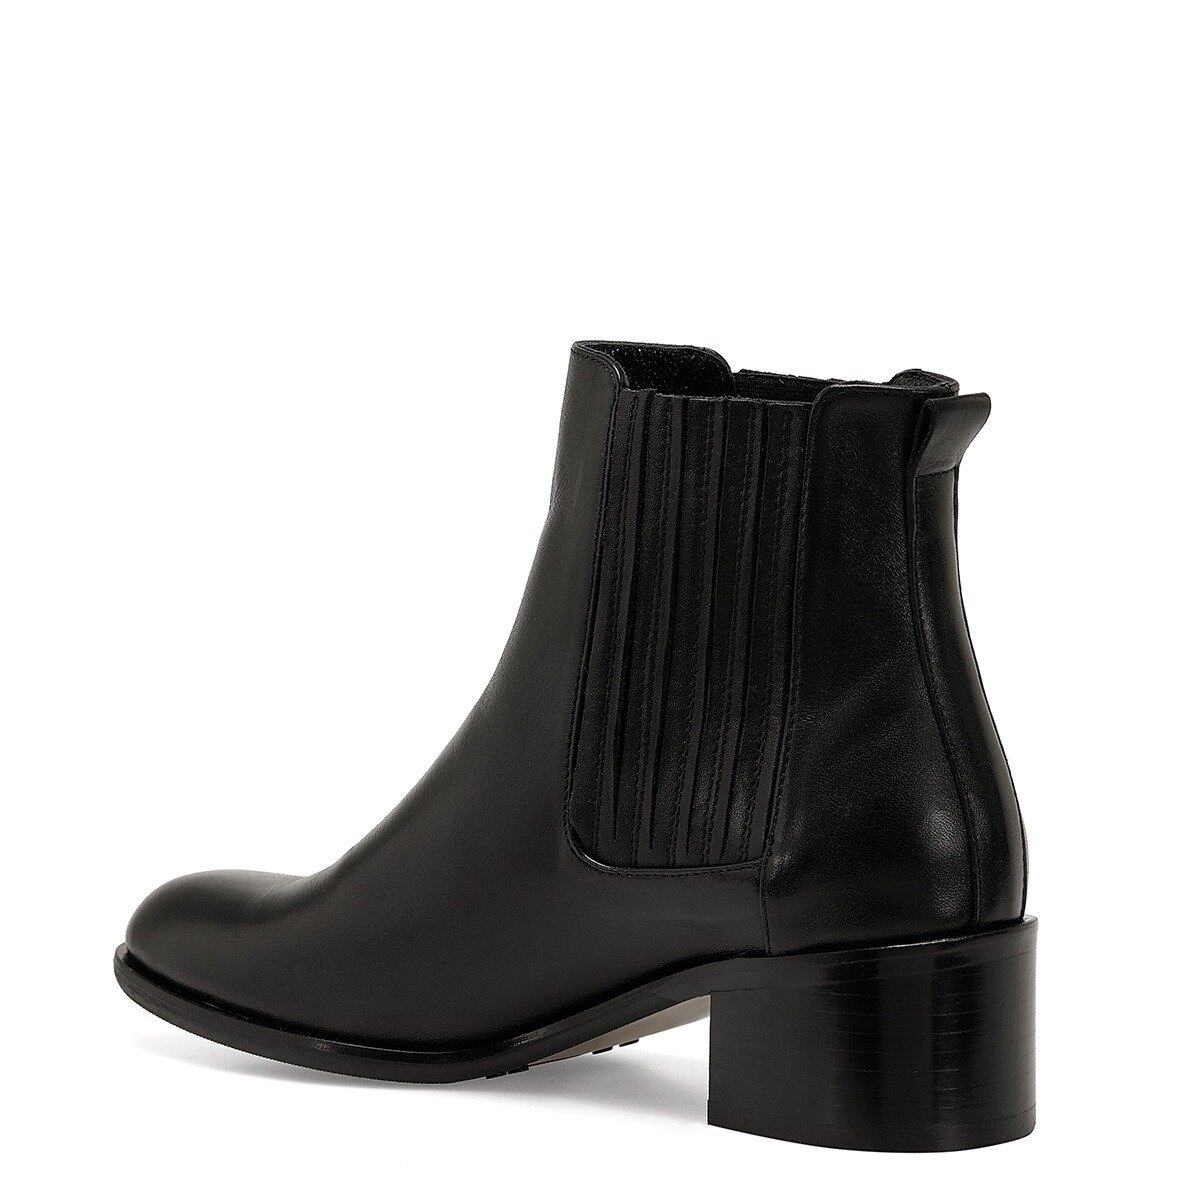 GALYANO Siyah Kadın Topuklu Bot